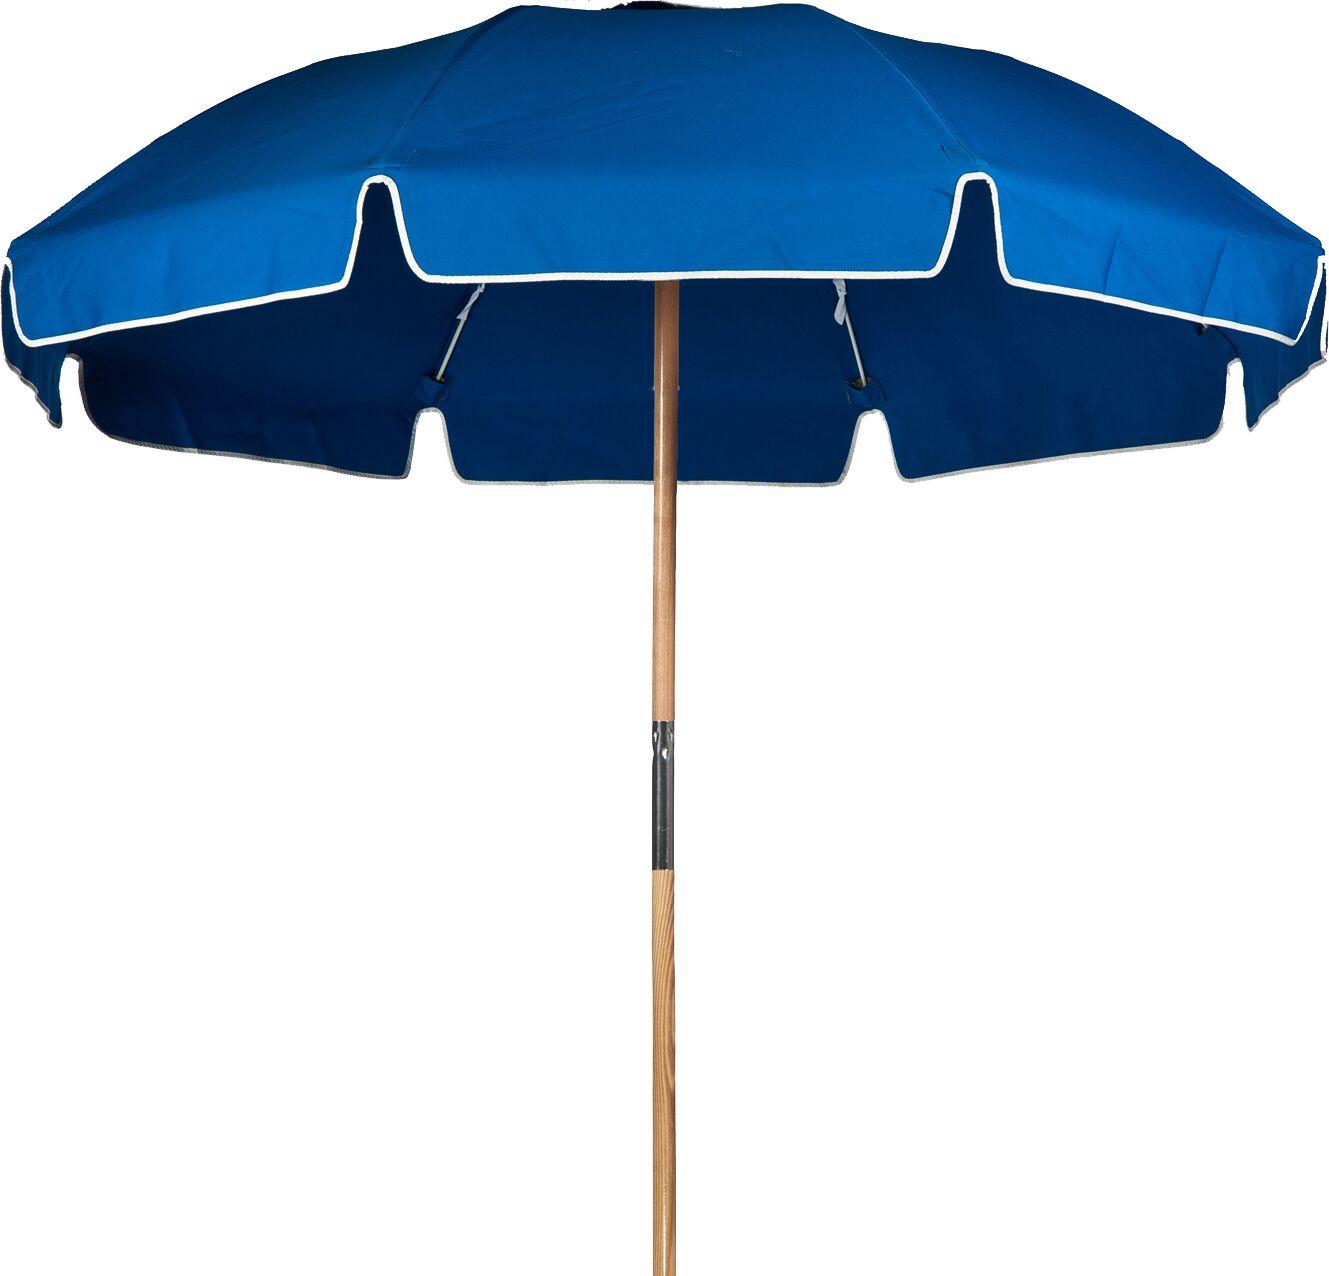 7.5' Beach Umbrella Fabric: Pacific Blue Acrylic